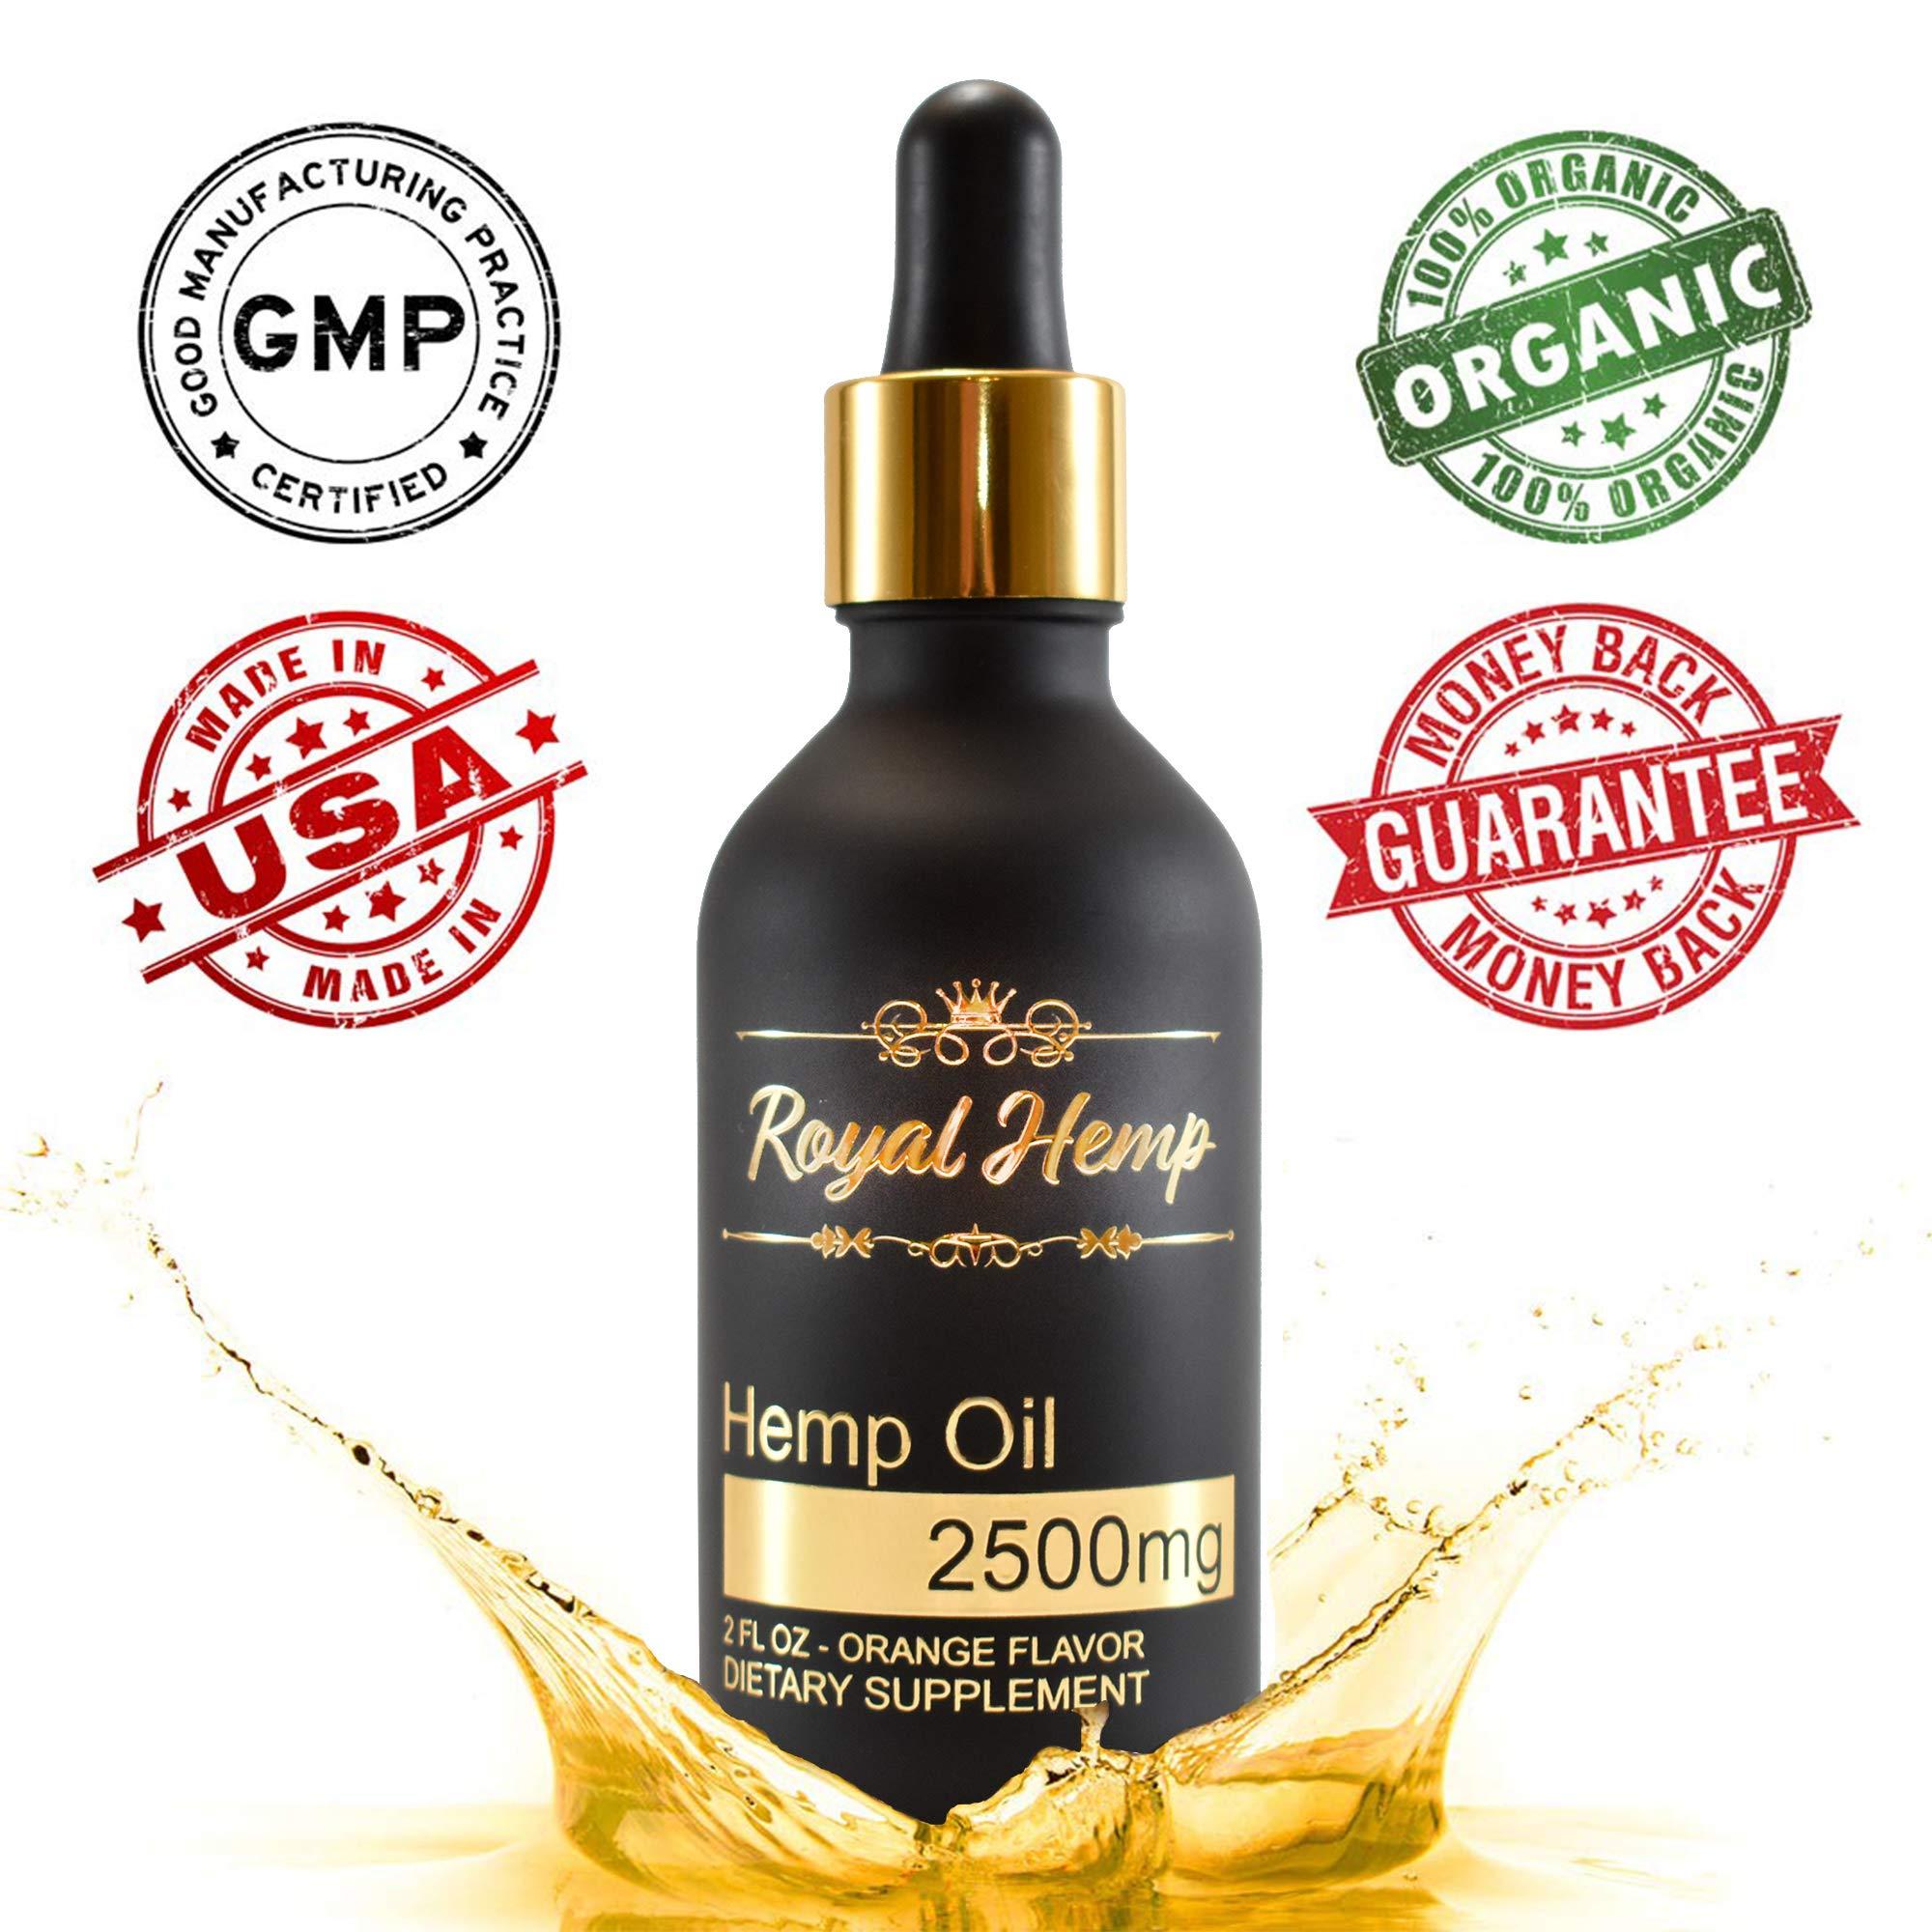 Royal Hemp - Hemp Oil for Pain & Anxiety Relief - 2500mg - Organic Hemp Drops - Natural Hemp Oils for Better Sleep, Mood & Stress - Pure Hemp Extract - Orange Flavor by Royal Hemp